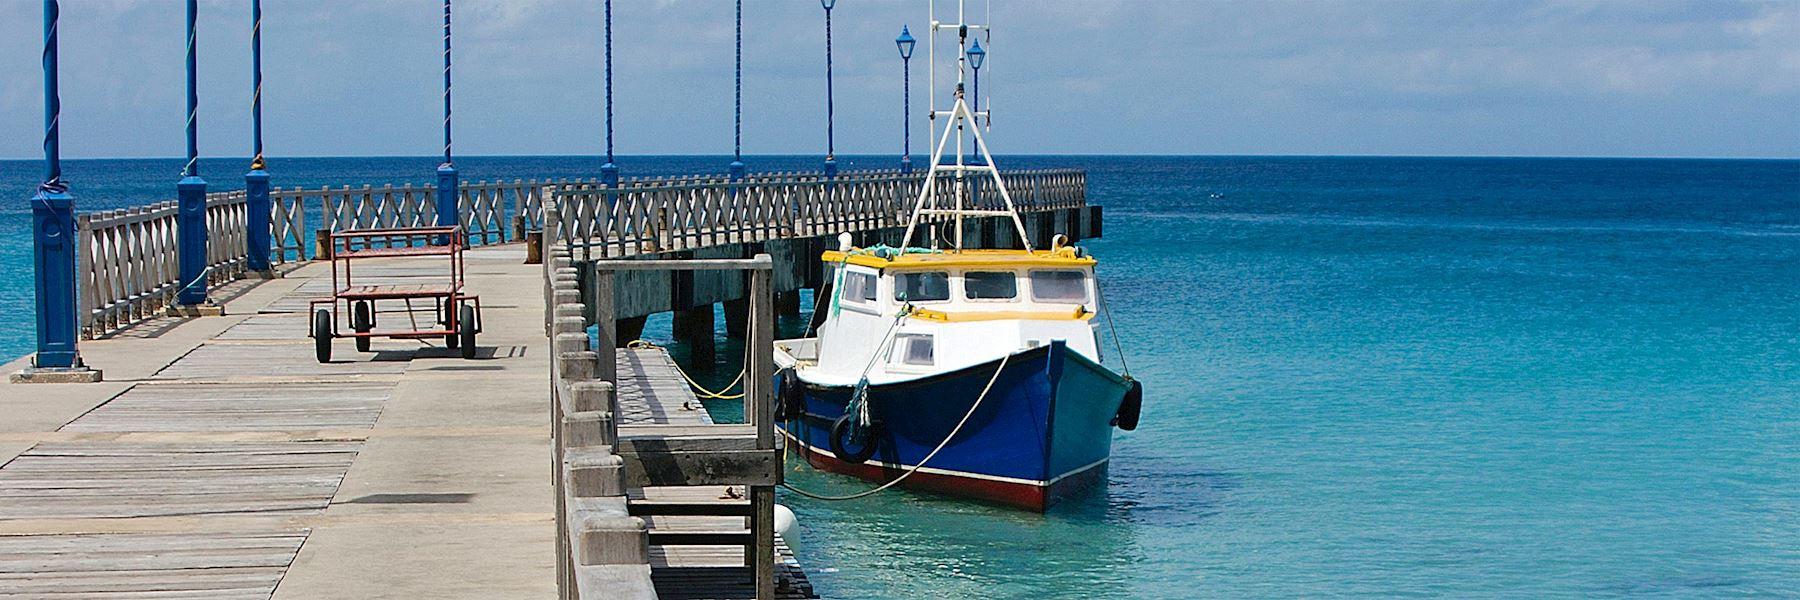 Visit Speightstown, Barbados